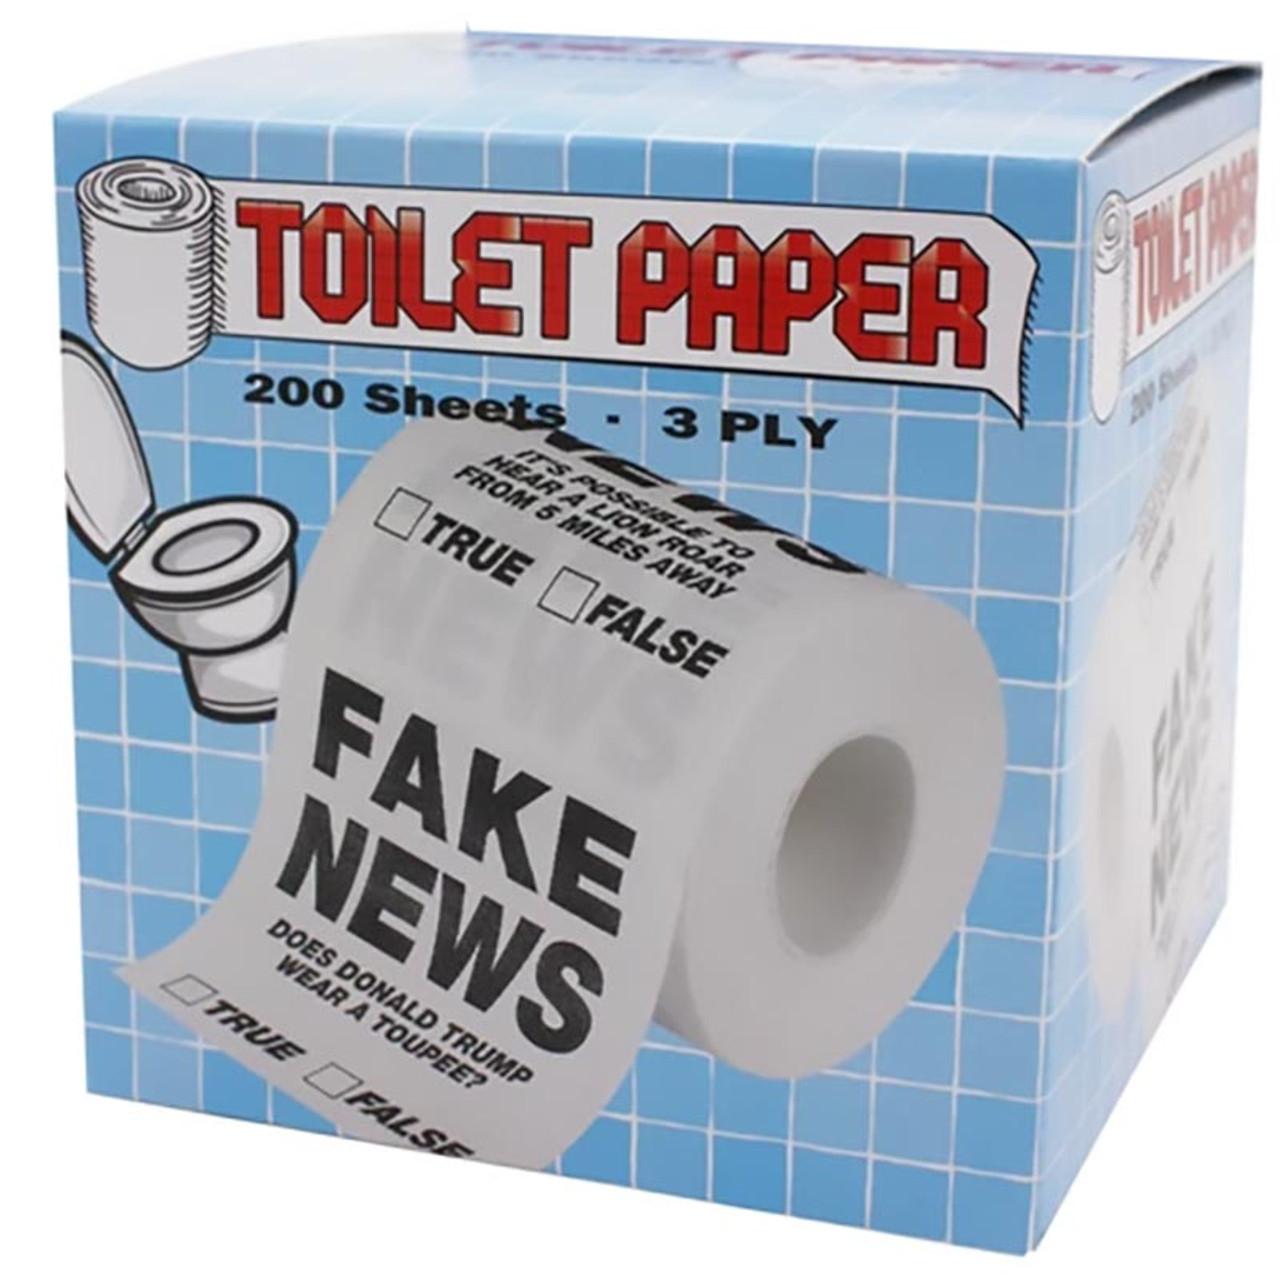 Fake News Novelty Toilet Paper